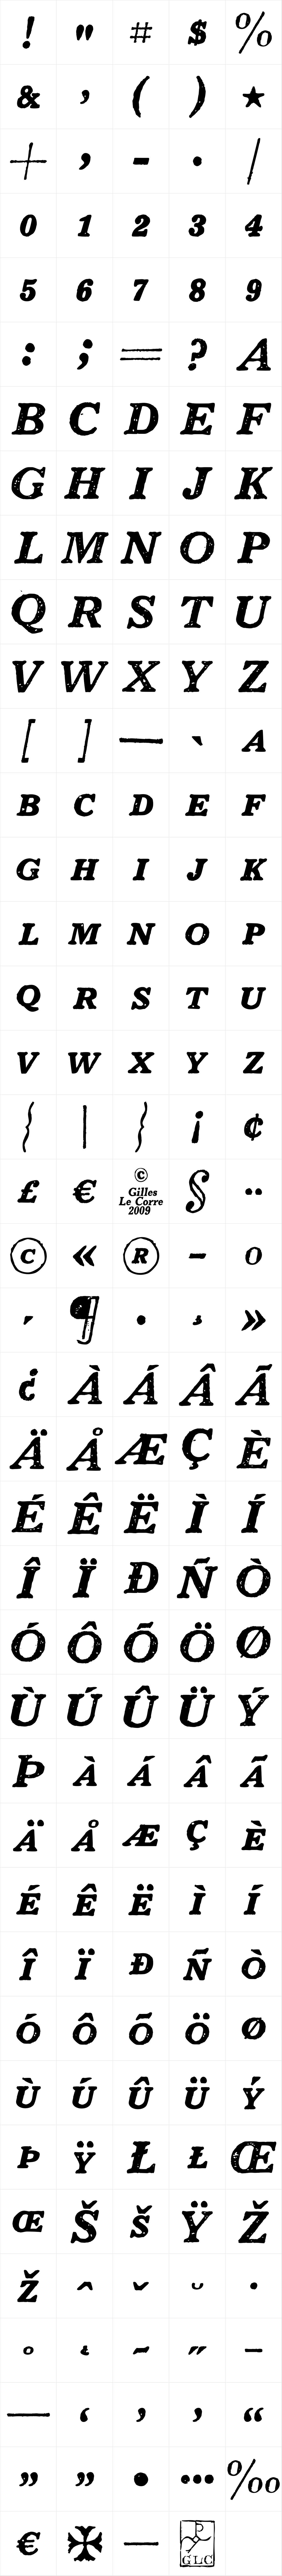 1906 French News Caps Bold Italic